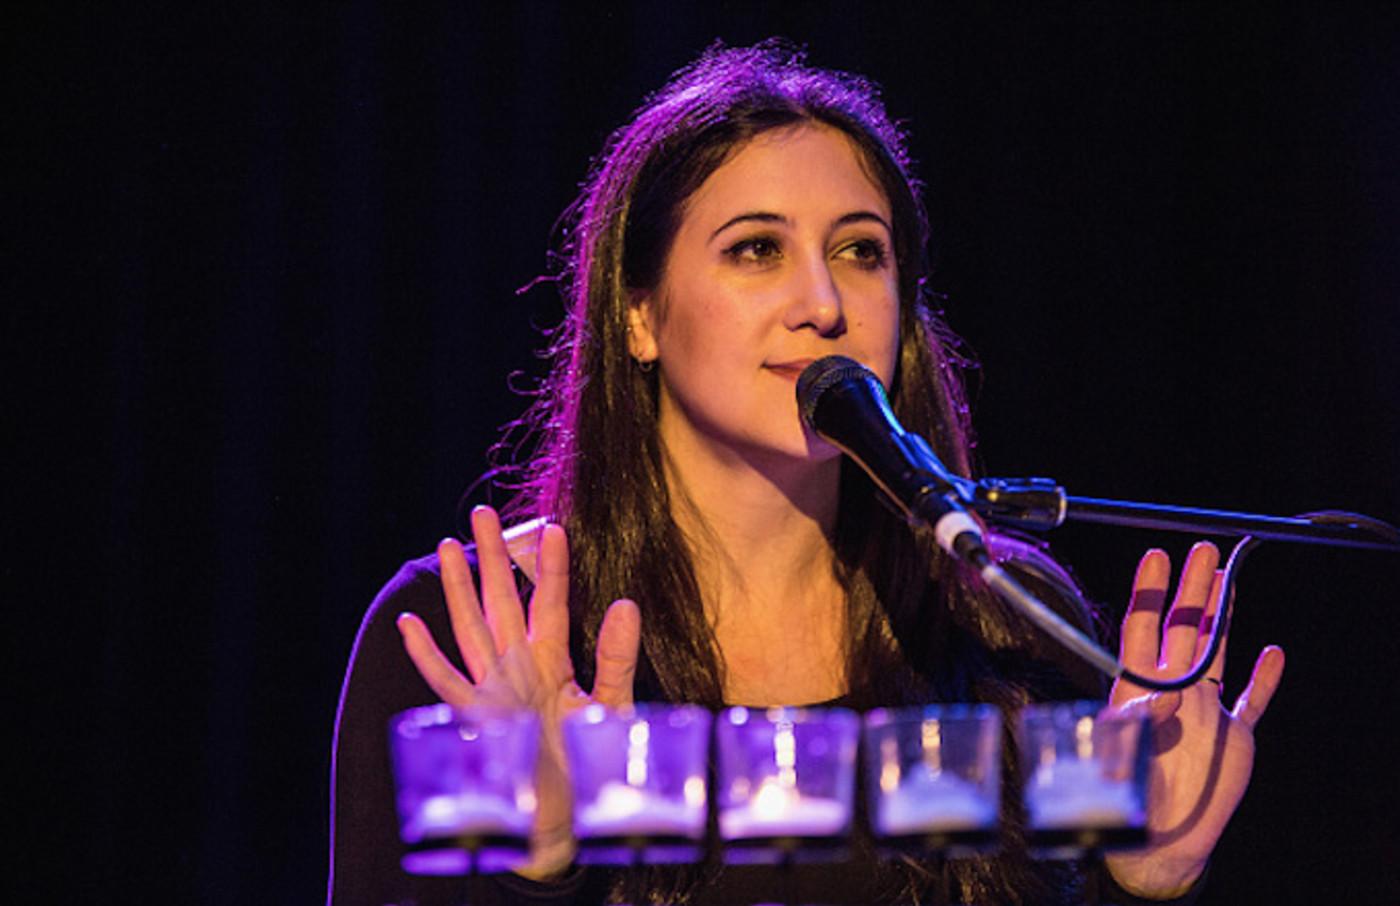 Vanessa Carlton performs at The Roxy Theatre